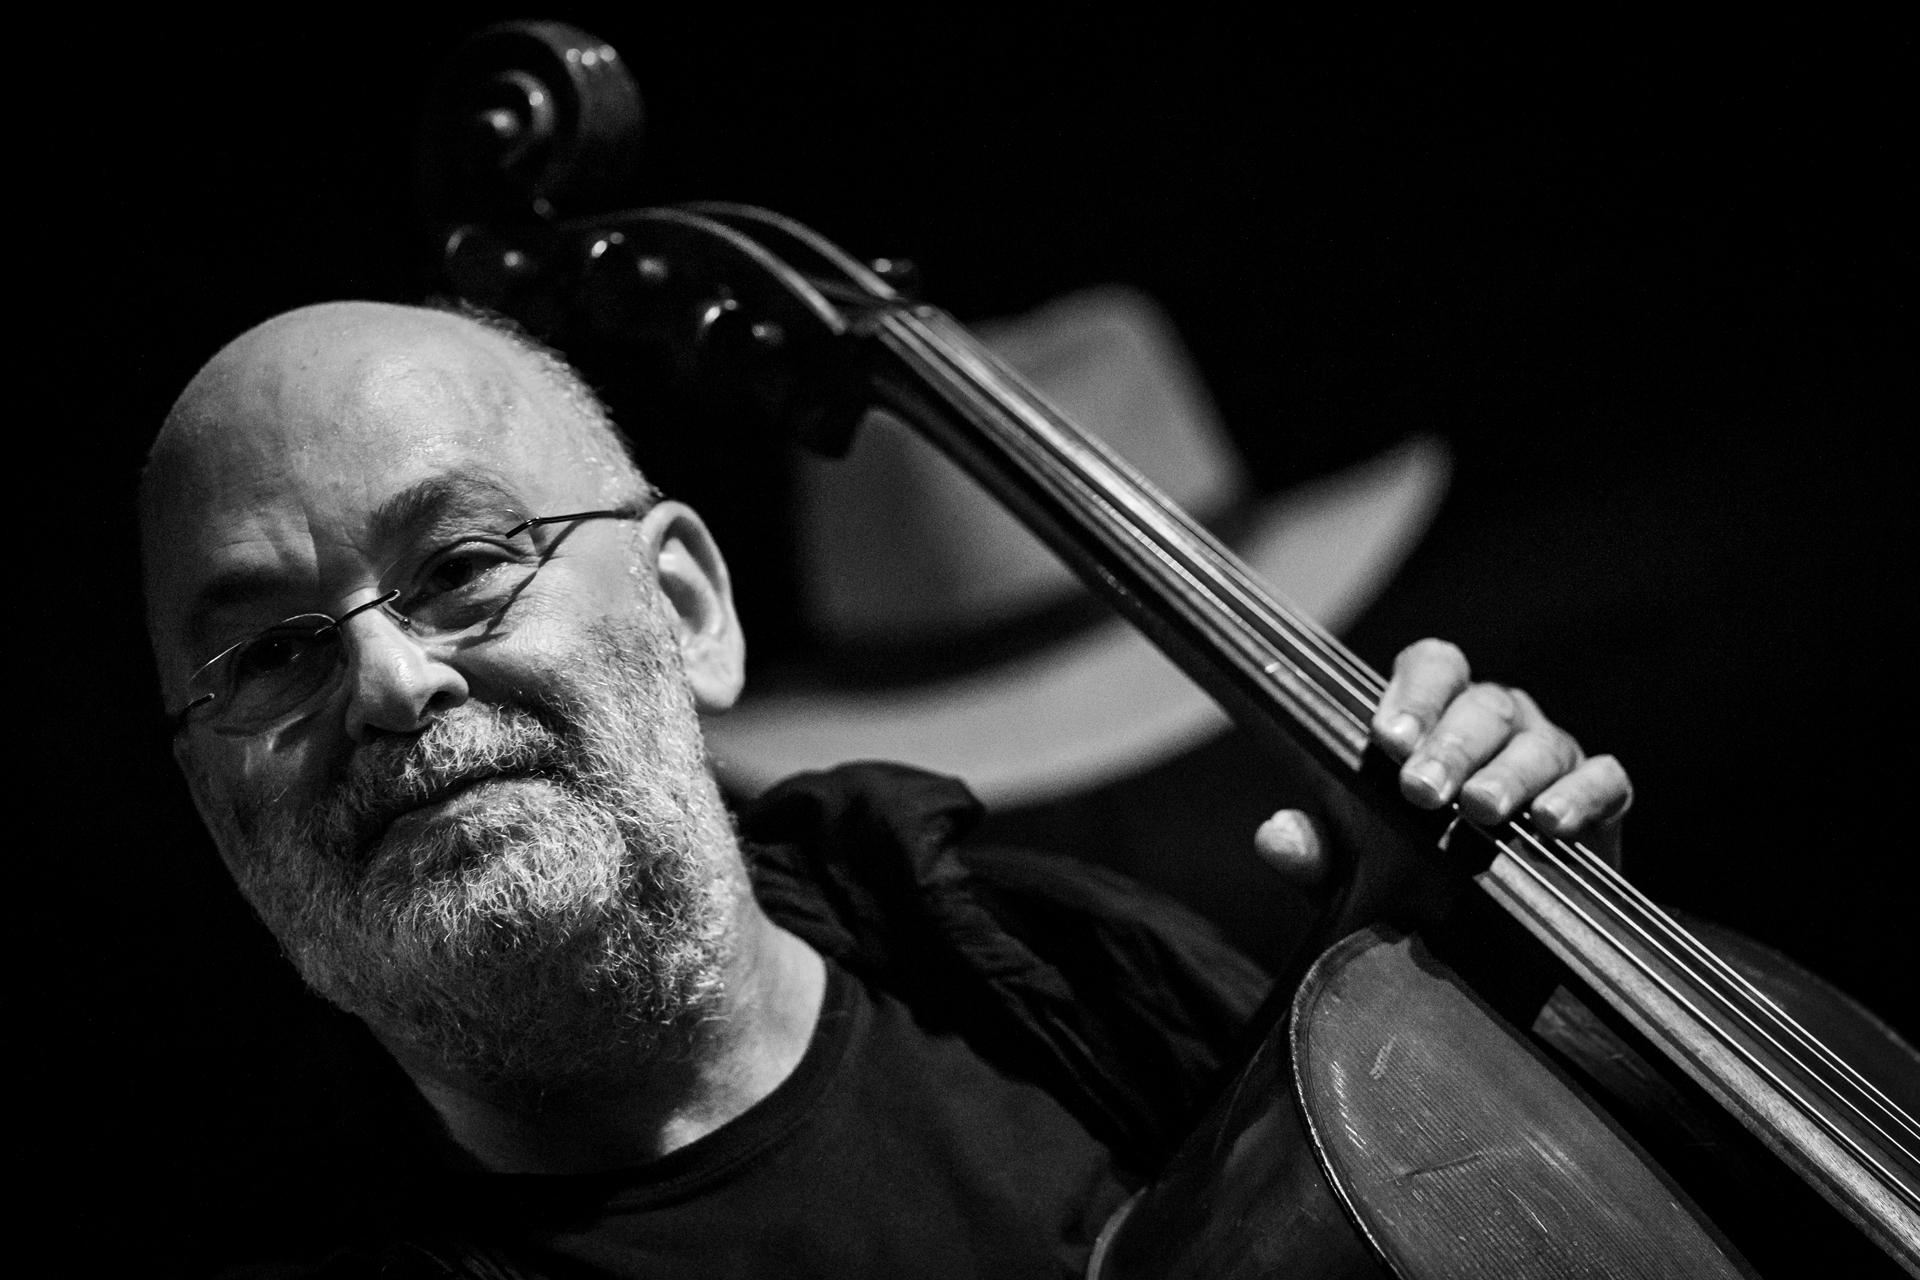 2019_09_05-Jaques-Morelenbaum-Cello-Samba-Trio-©-Luca-Vantusso-213226-5D4B5148